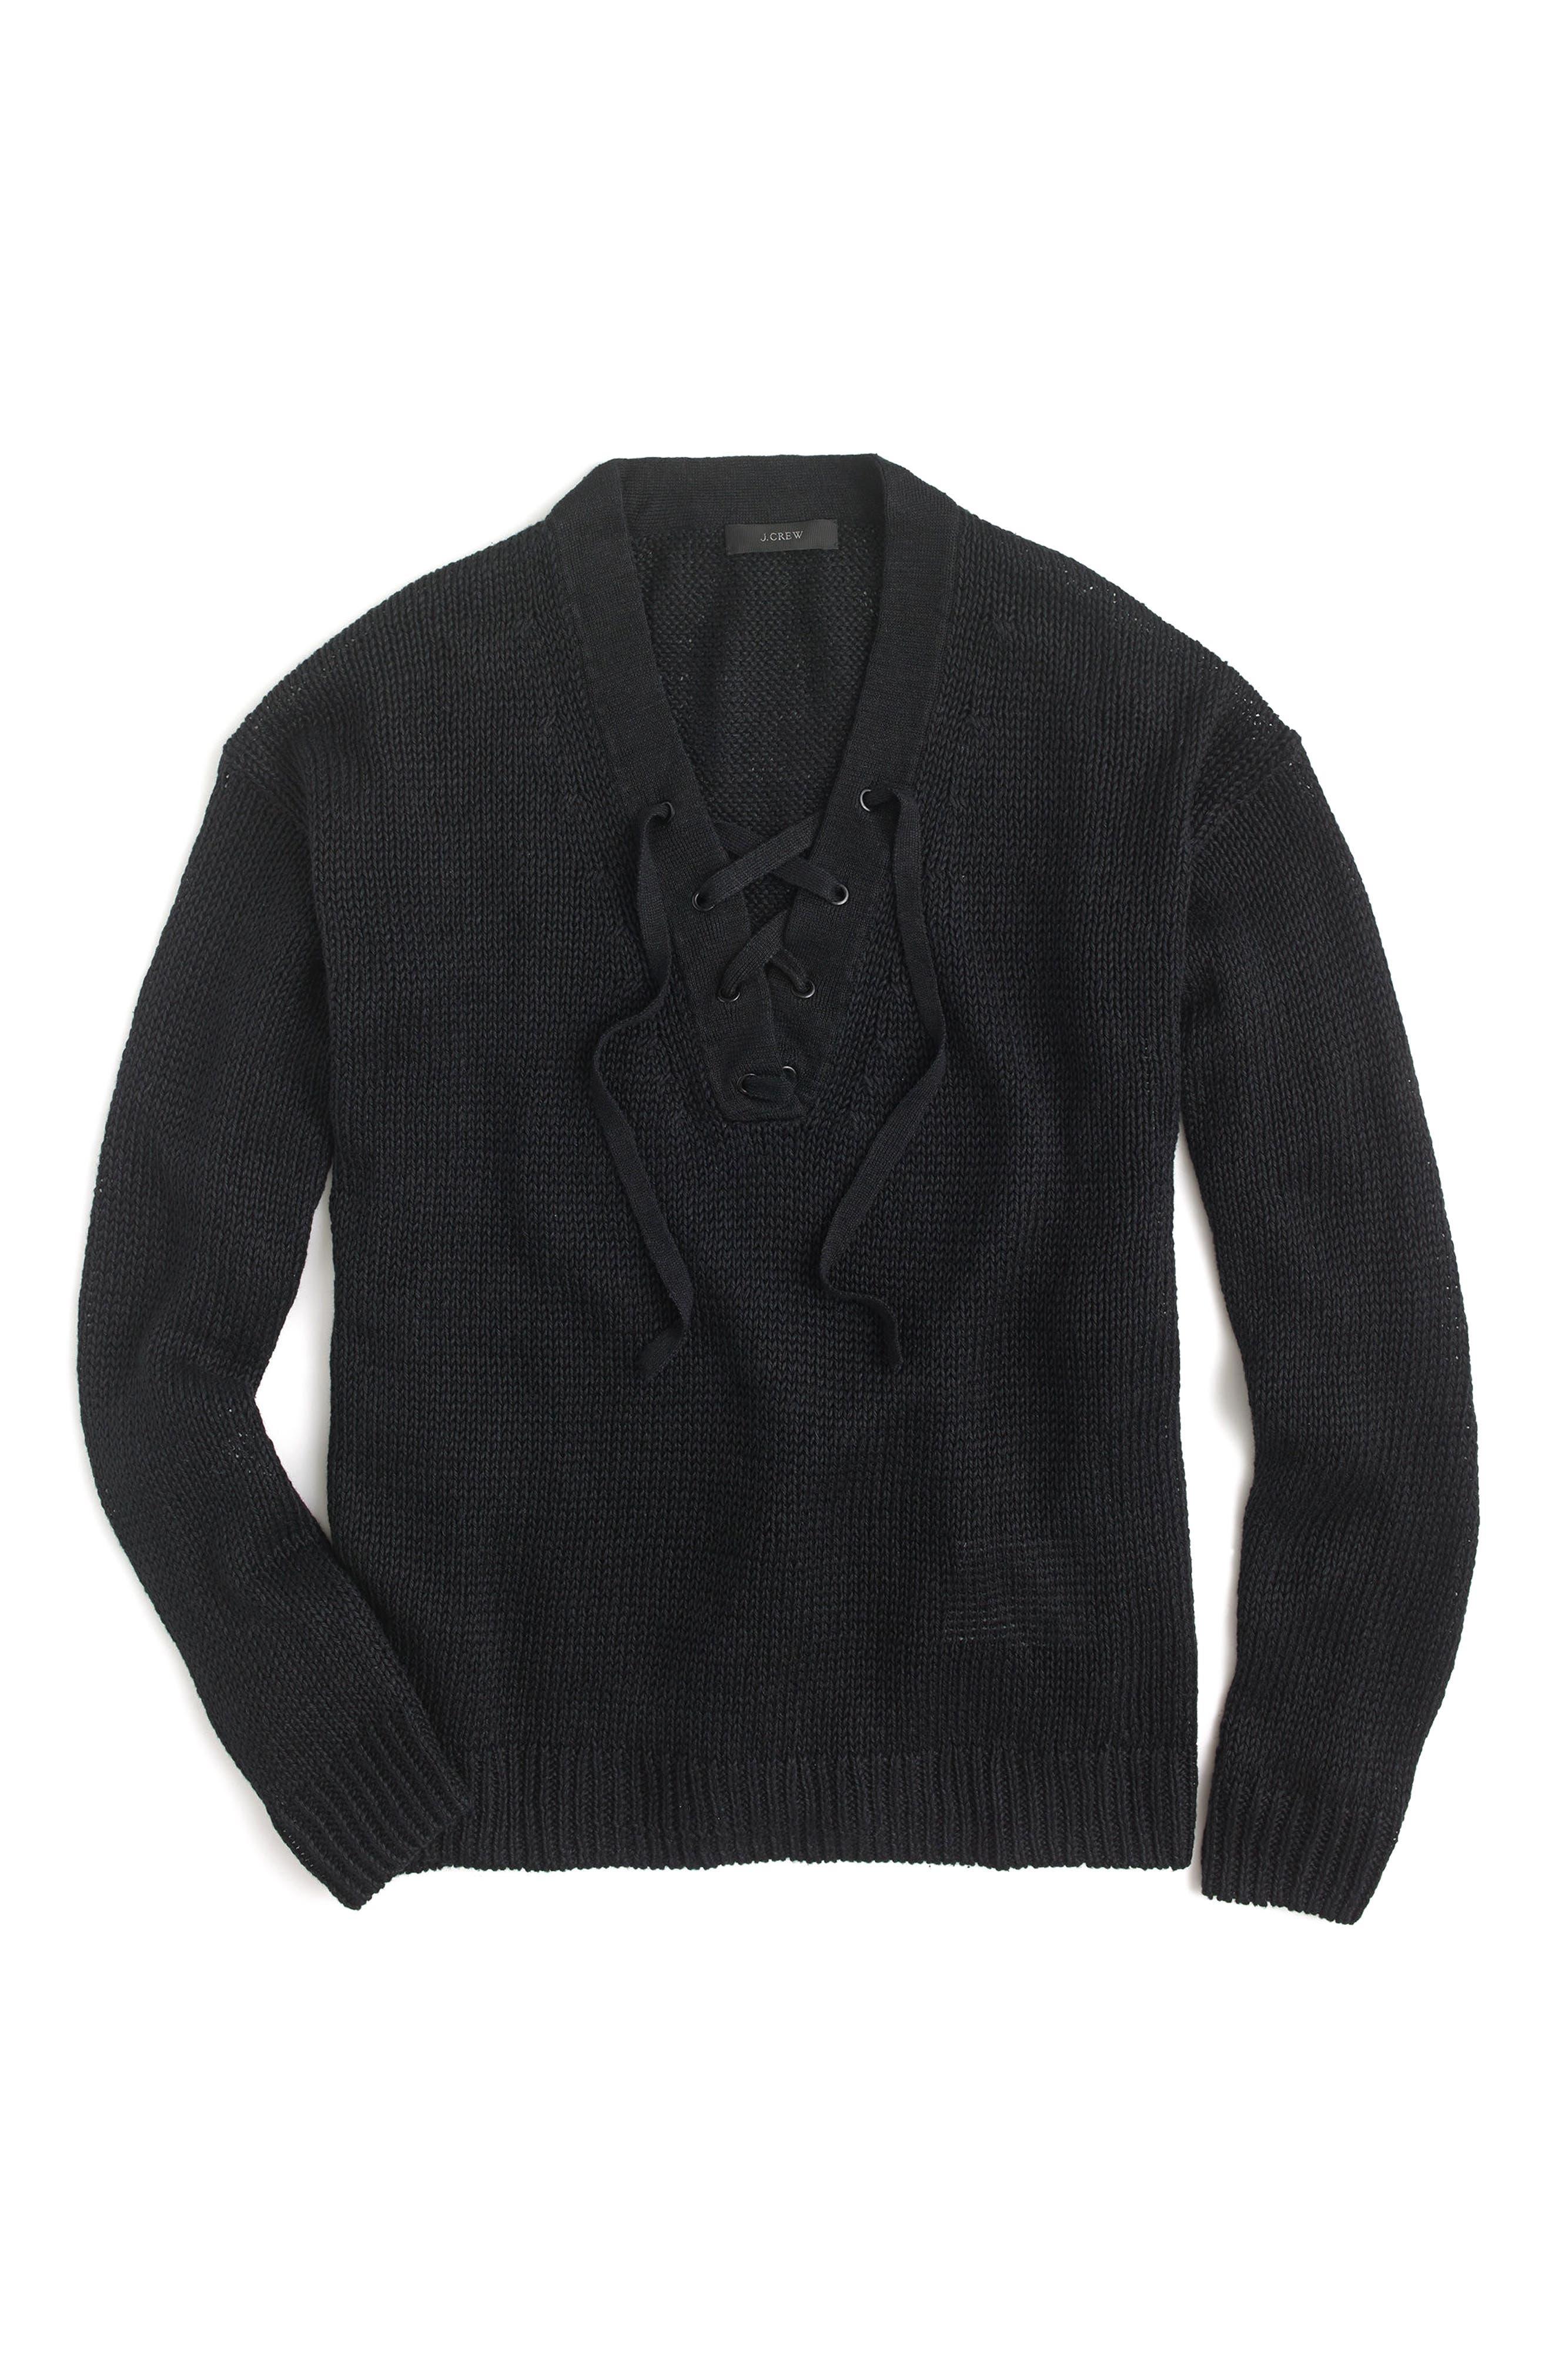 Main Image - J.Crew Linen Lace-Up Beach Sweater